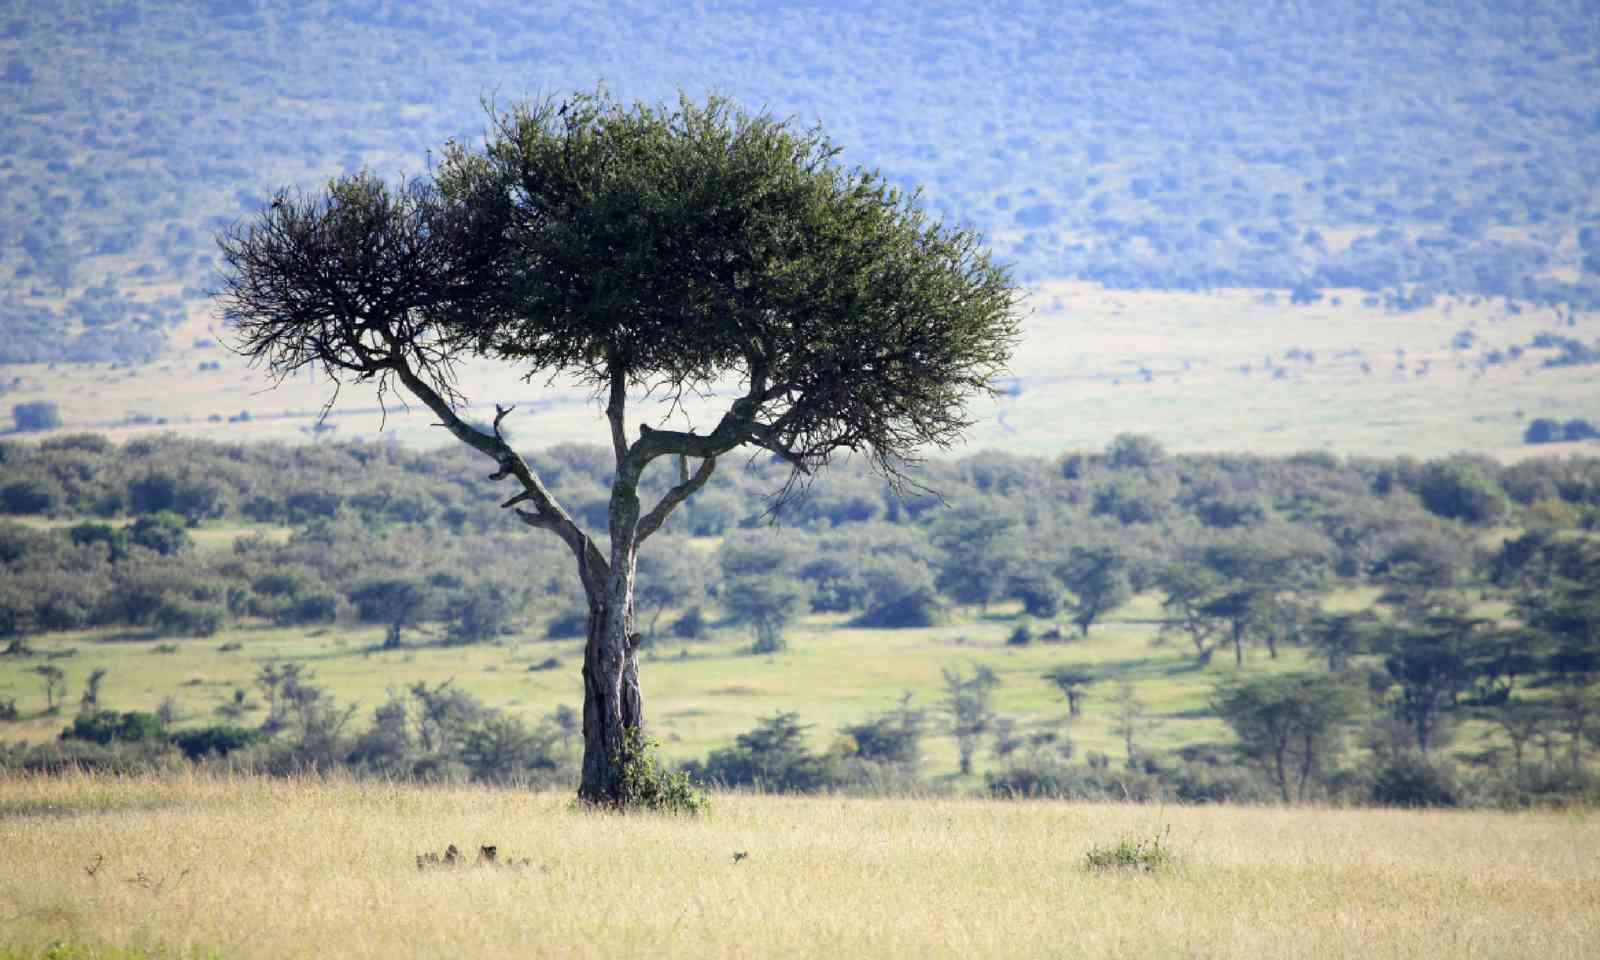 Great Rift Valley in Kenya (Shutterstock)